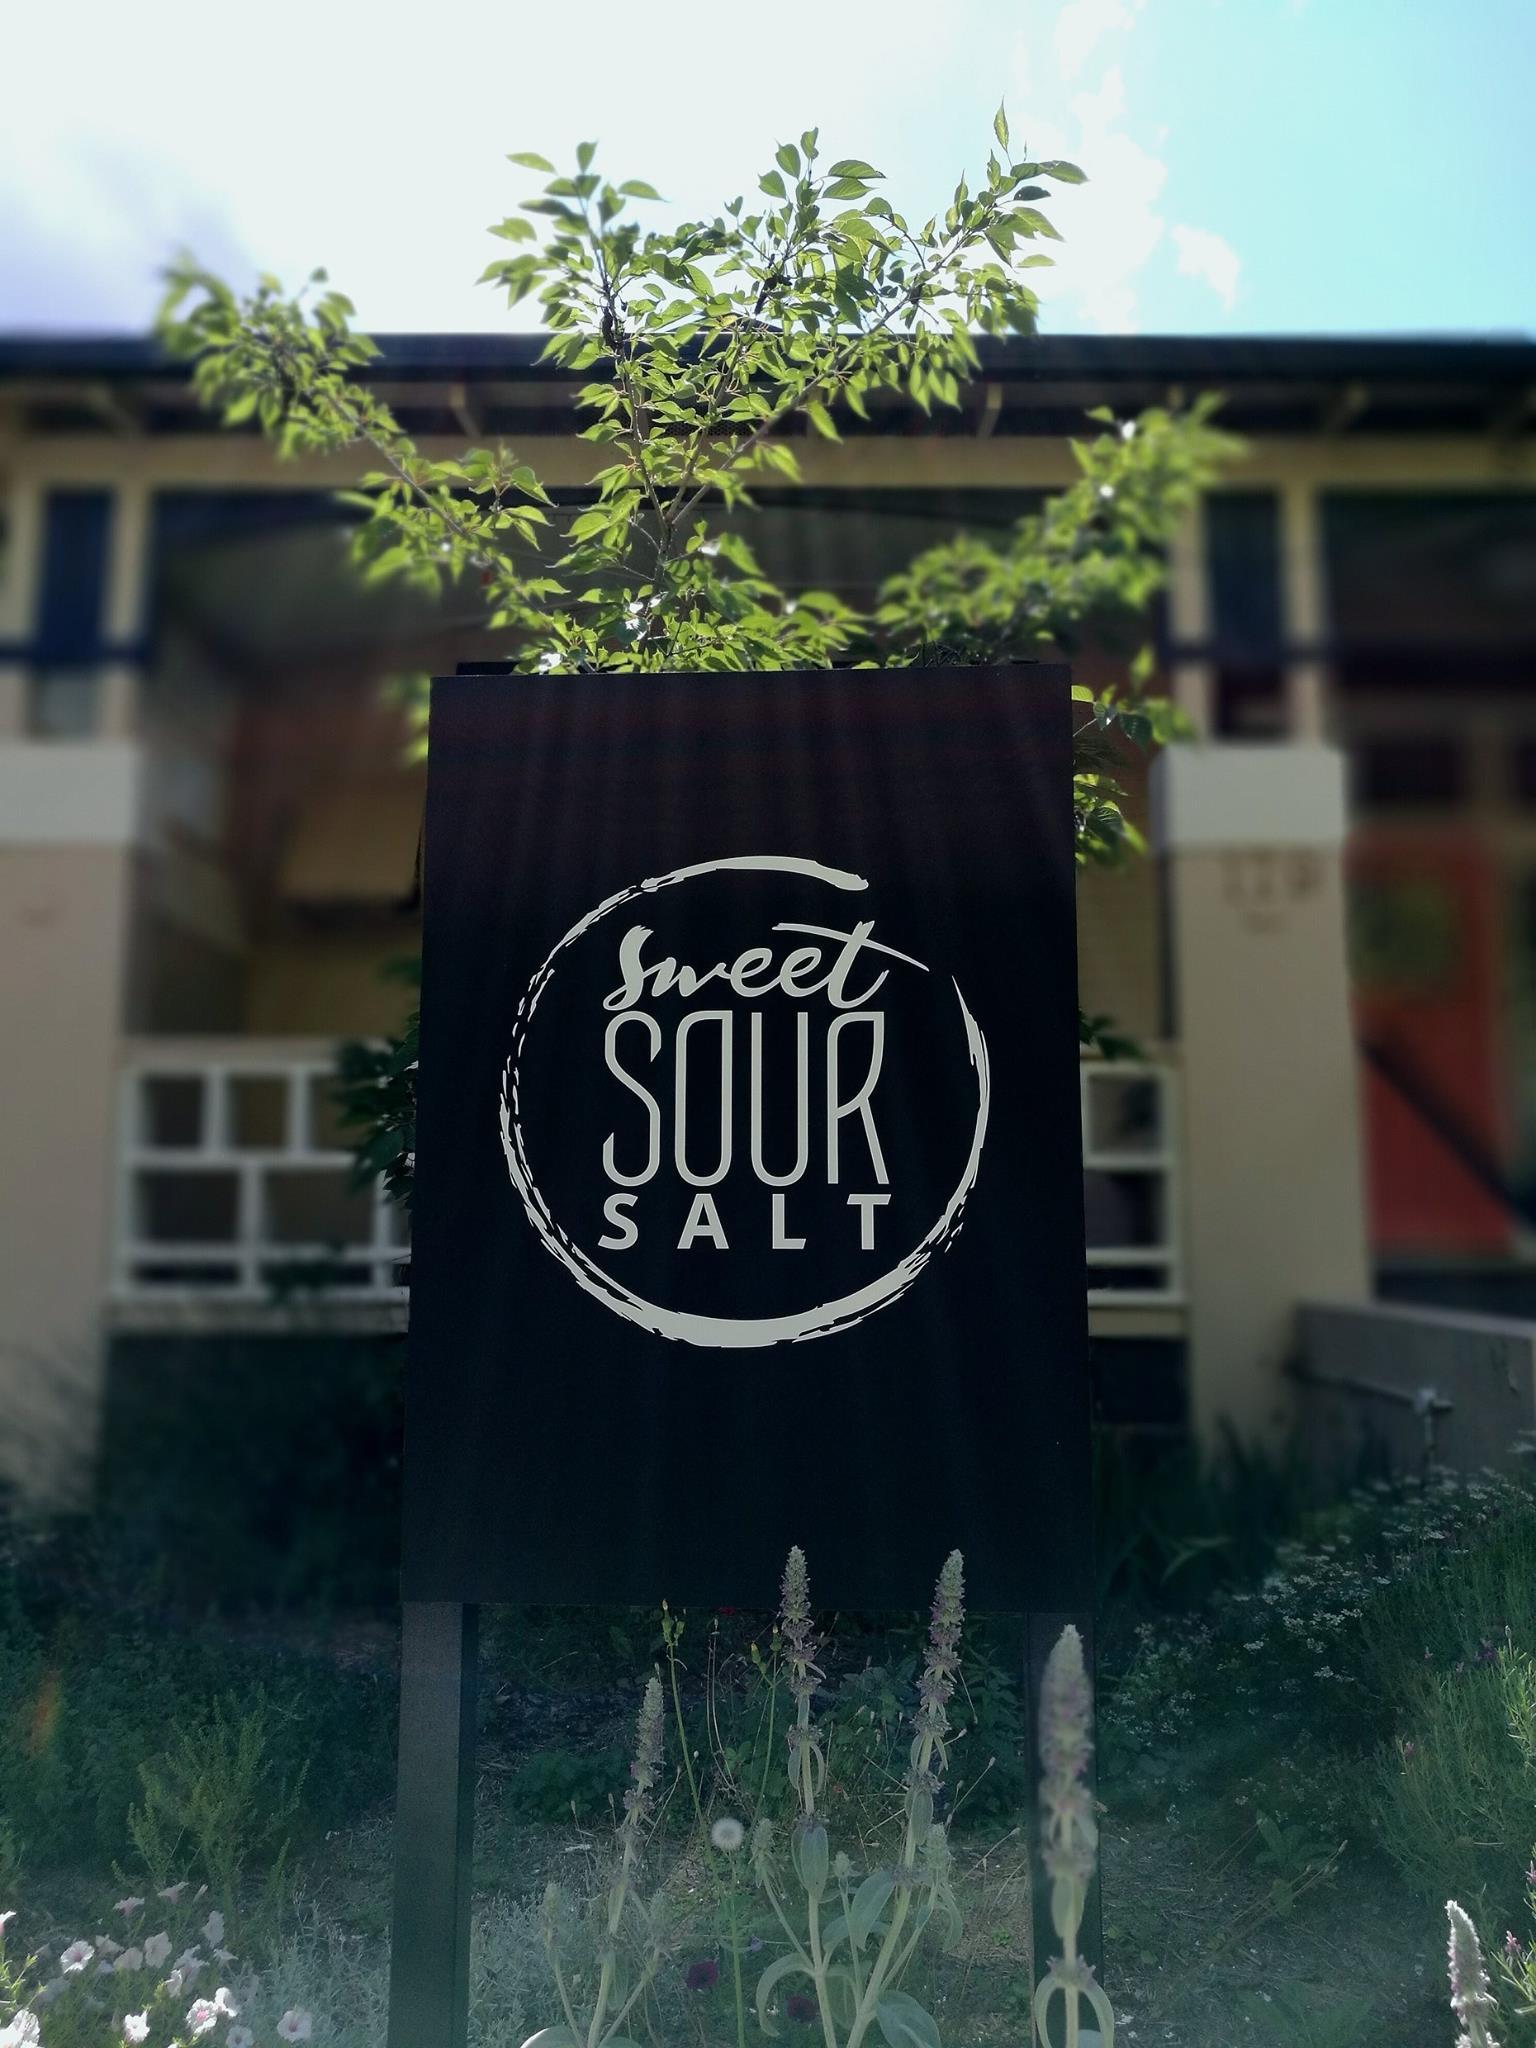 sweet-sour-salt-3.jpg